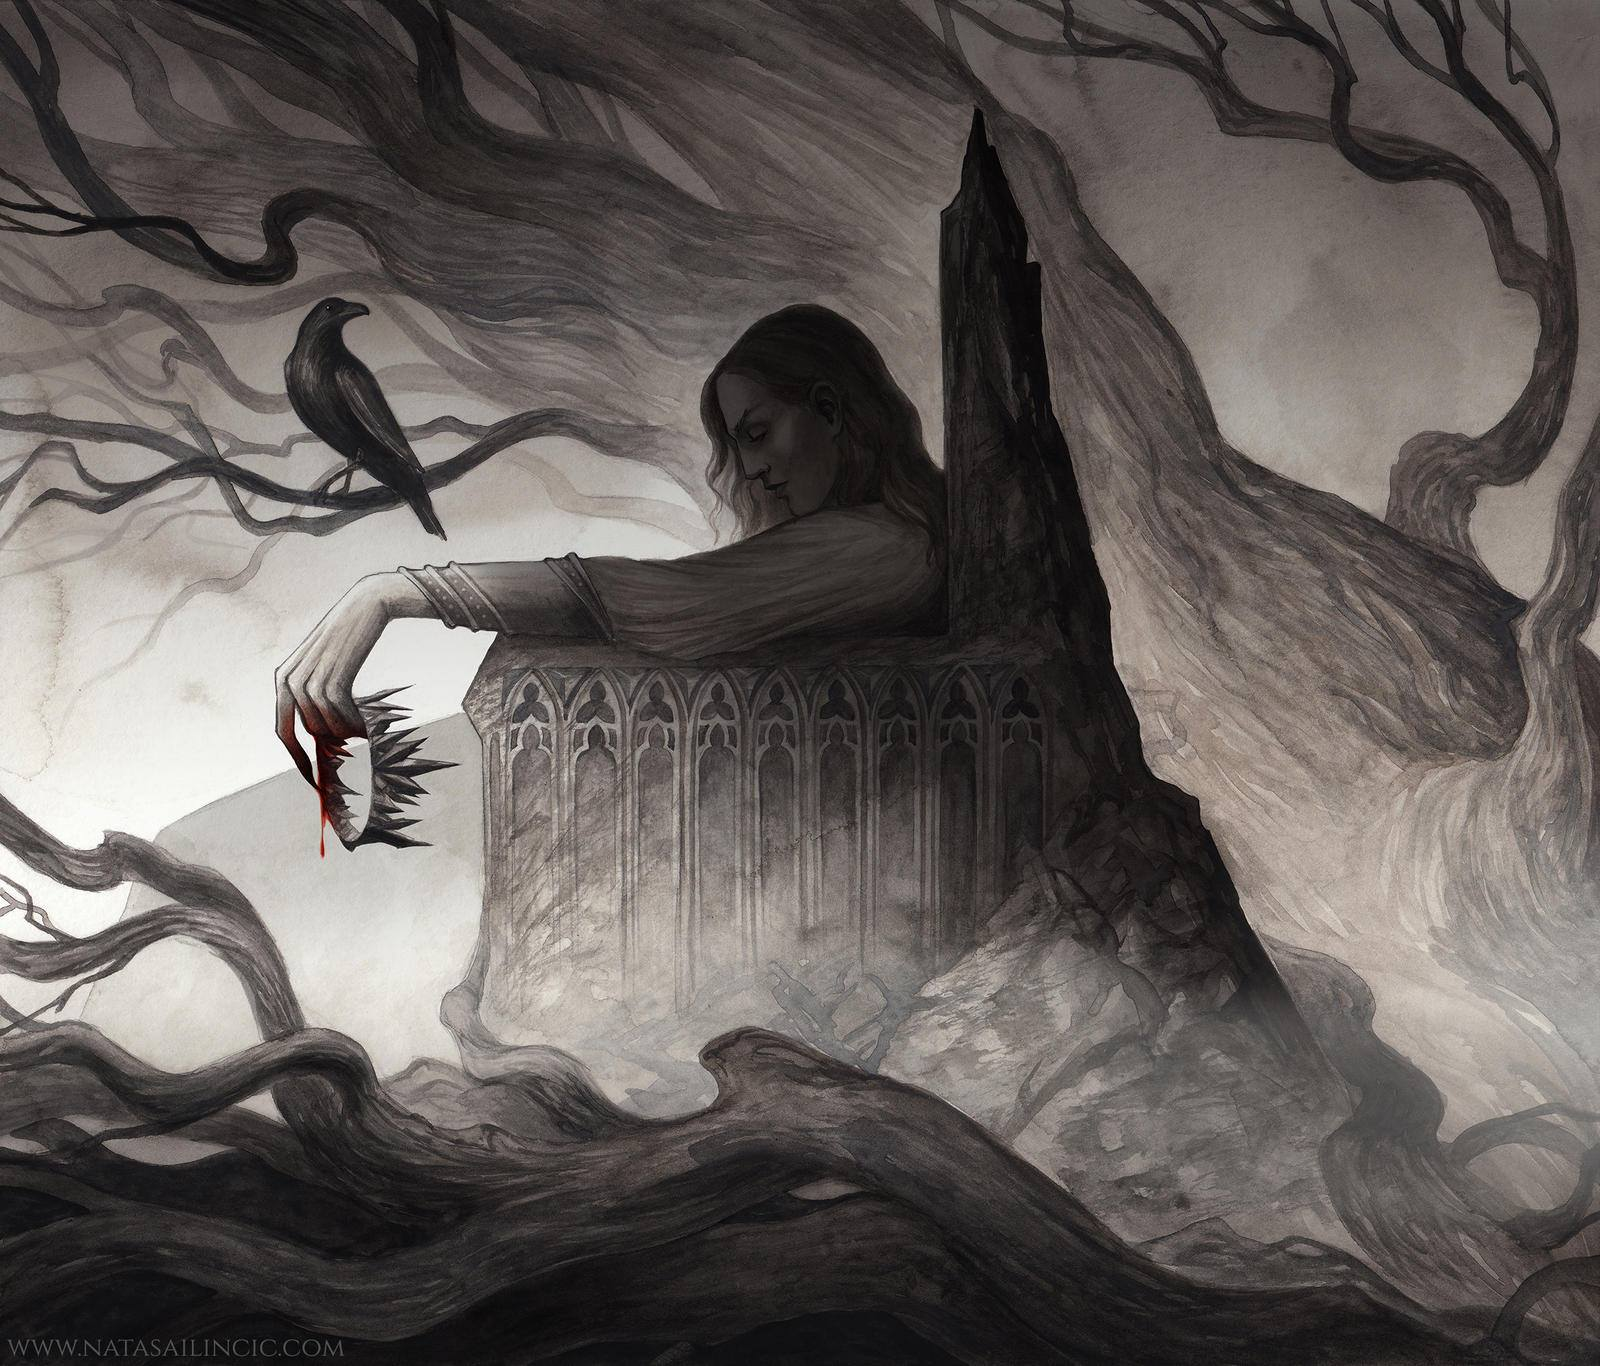 Nataša Ilinčić - The Raven's Ballad: A Retelling of the Swan Princess (Otherworld Book 5) by Emma Hamm